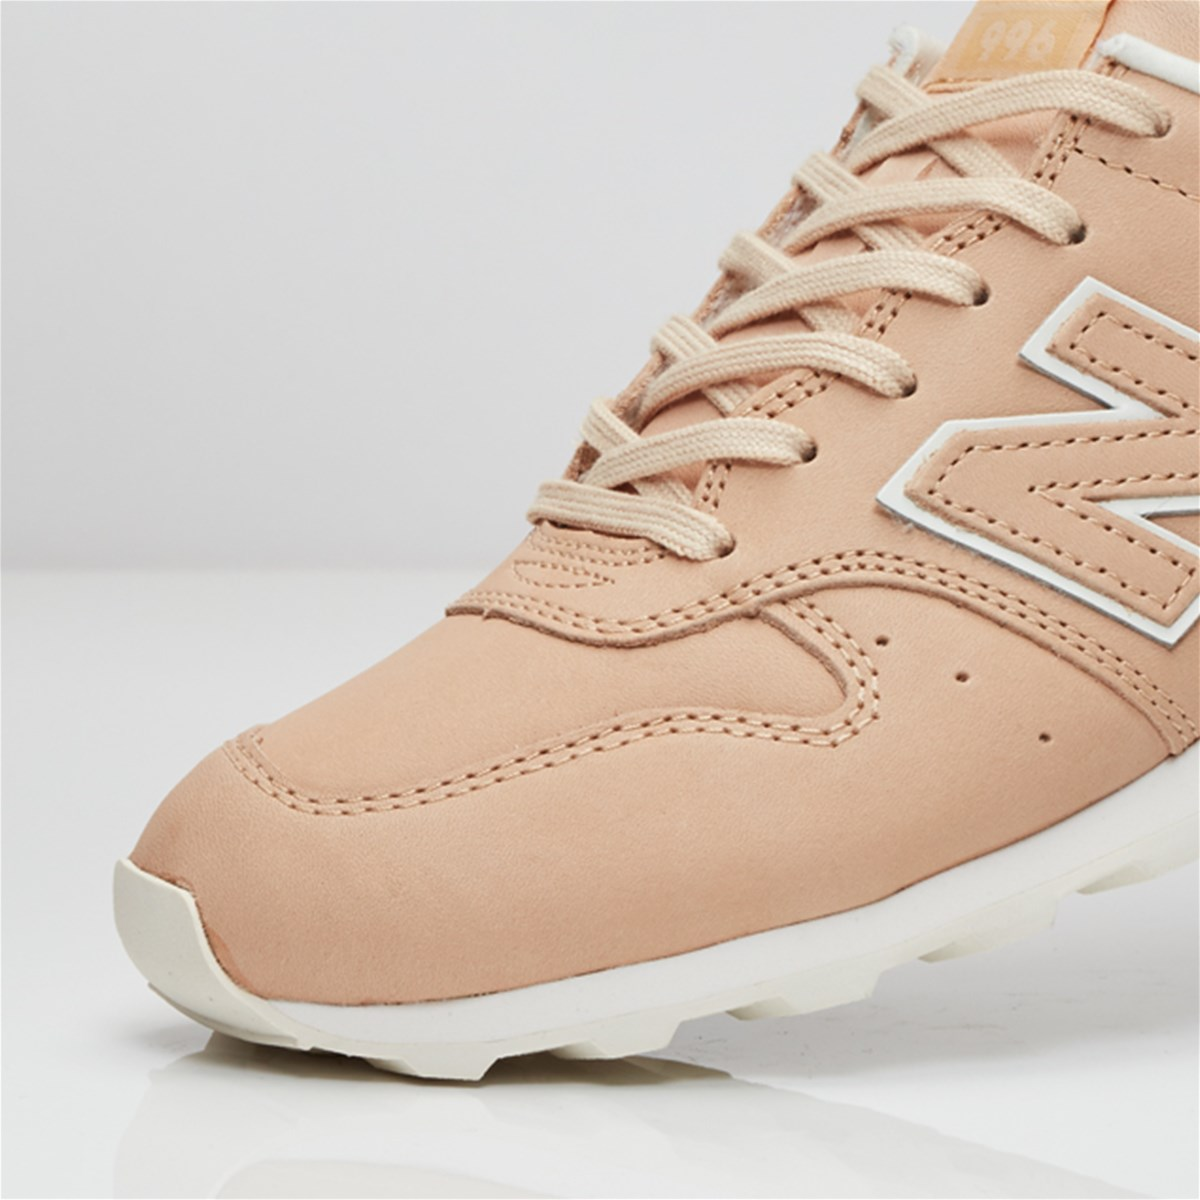 new balance 996 womens shoes sneaker beige wr996jt